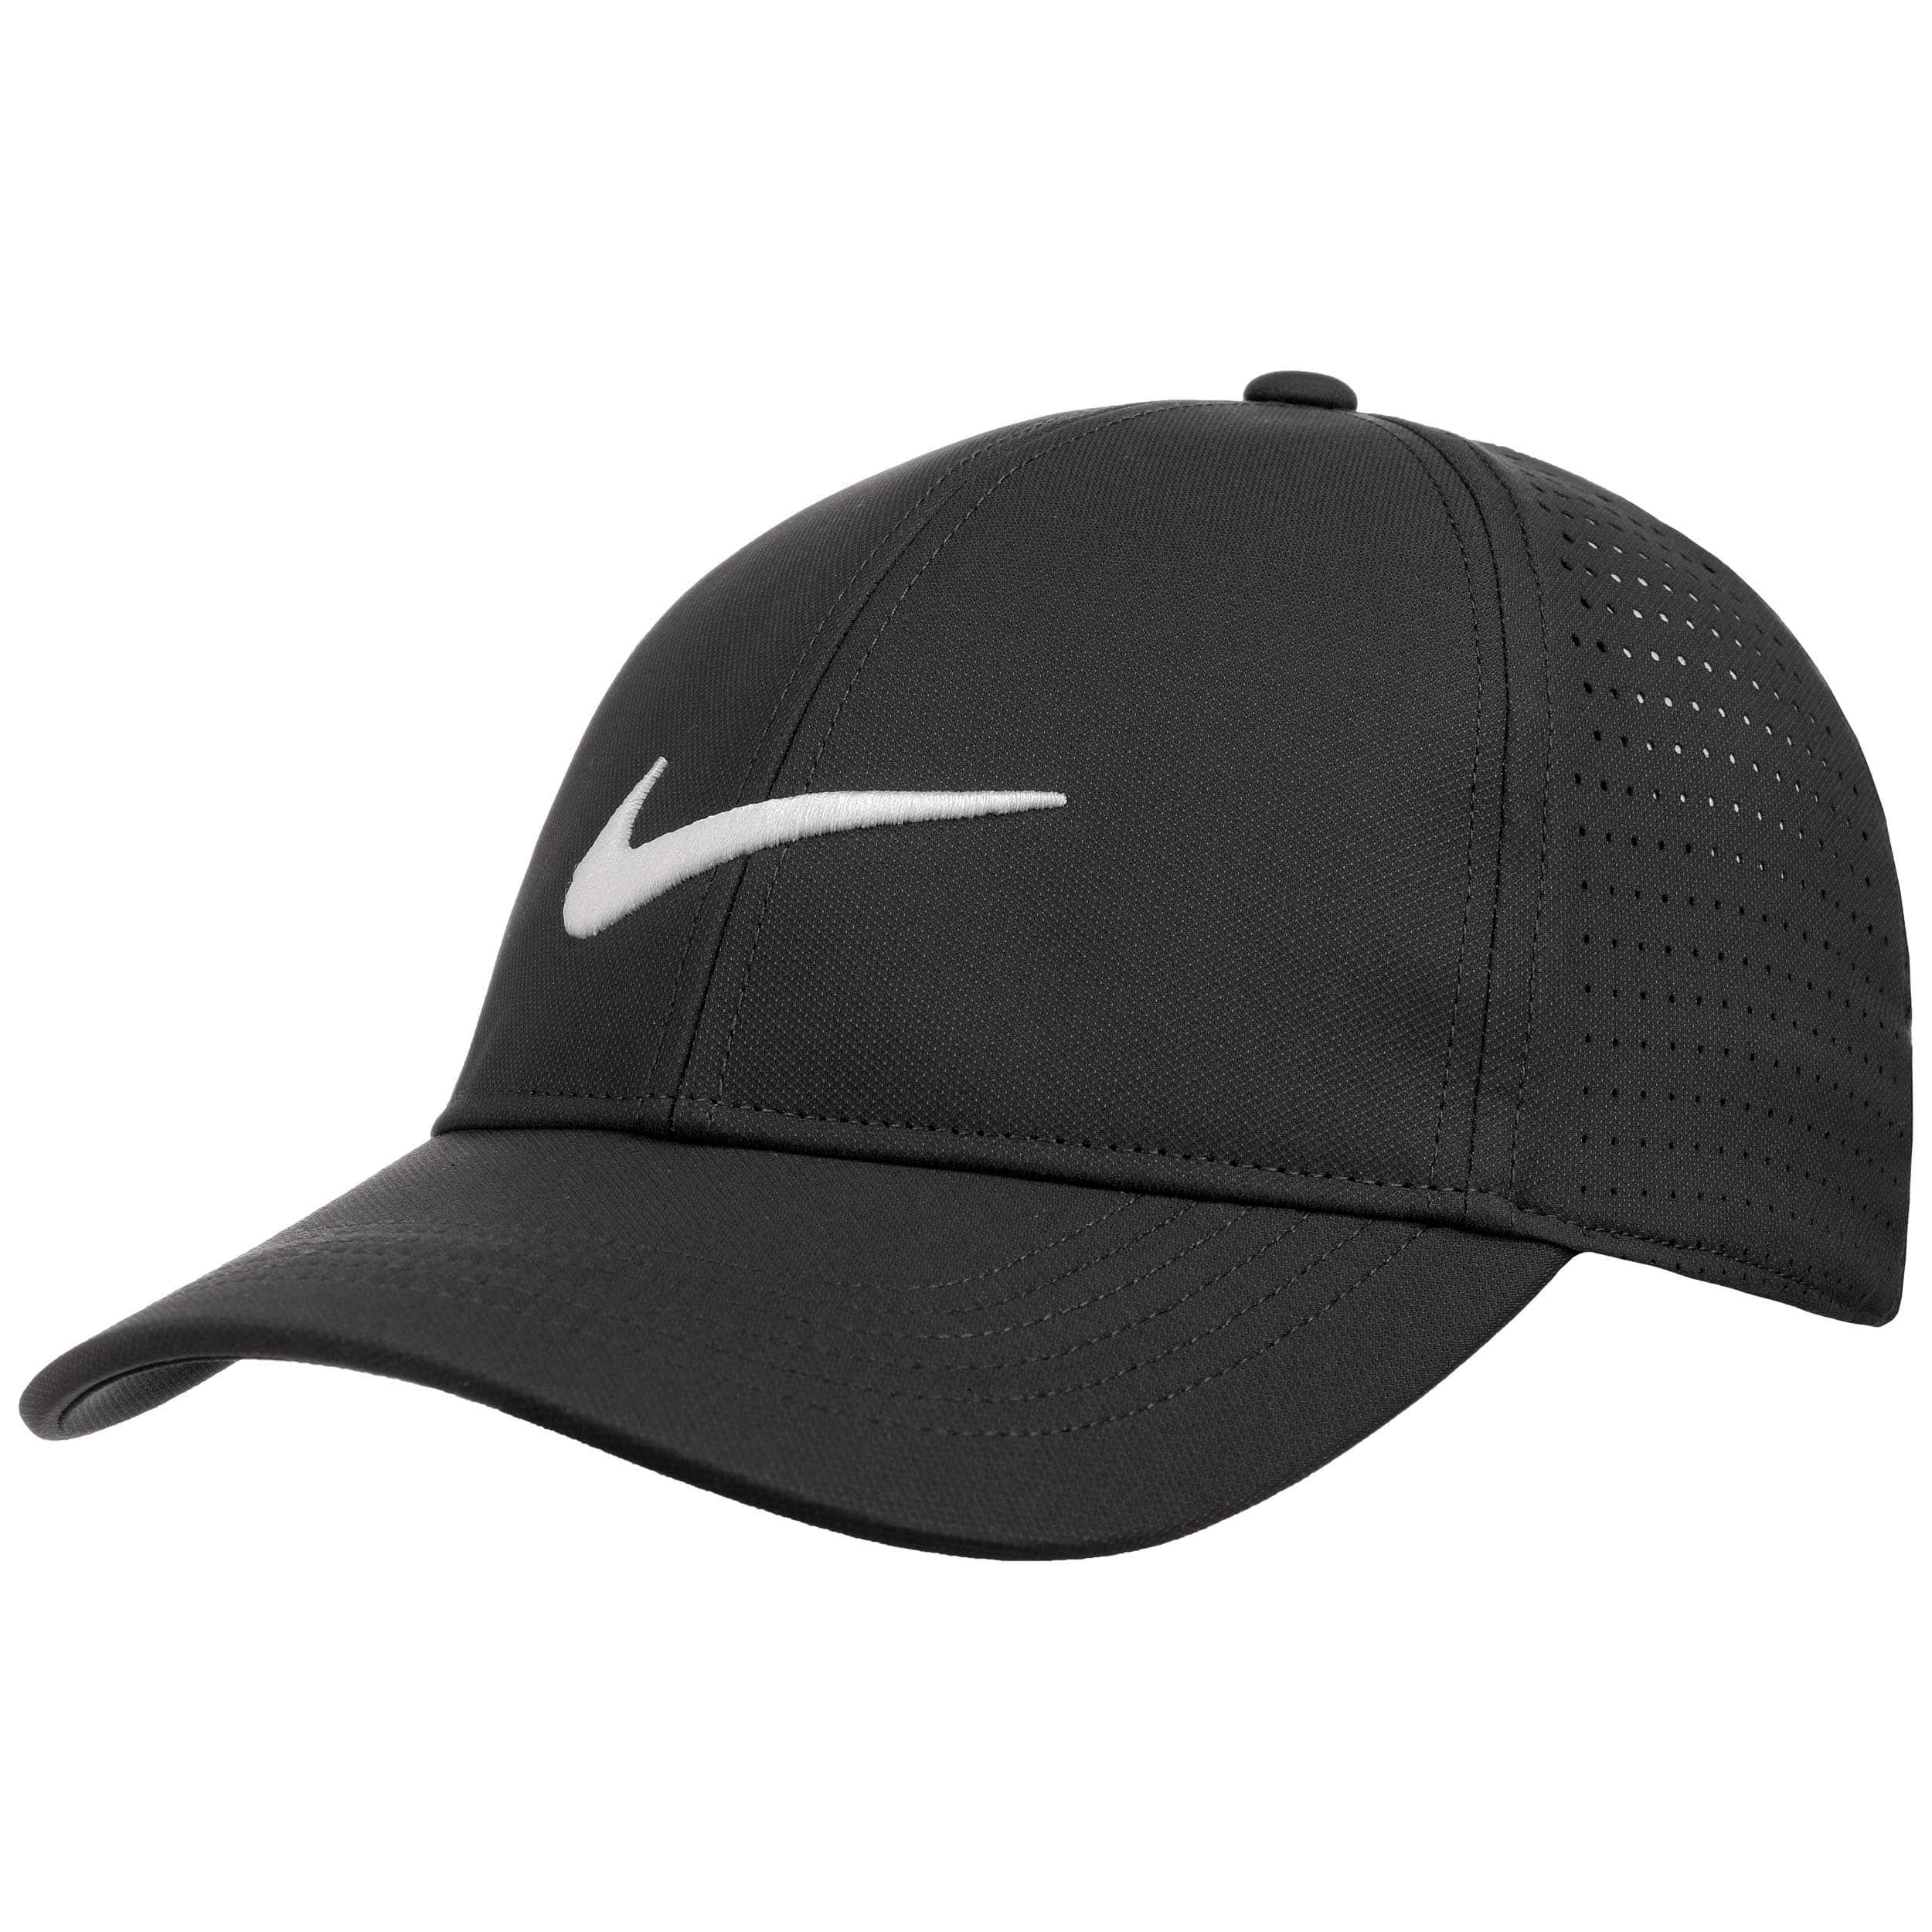 ... Cappellino Legacy 91 Perf by Nike - nero 6 ... beed8092afbf